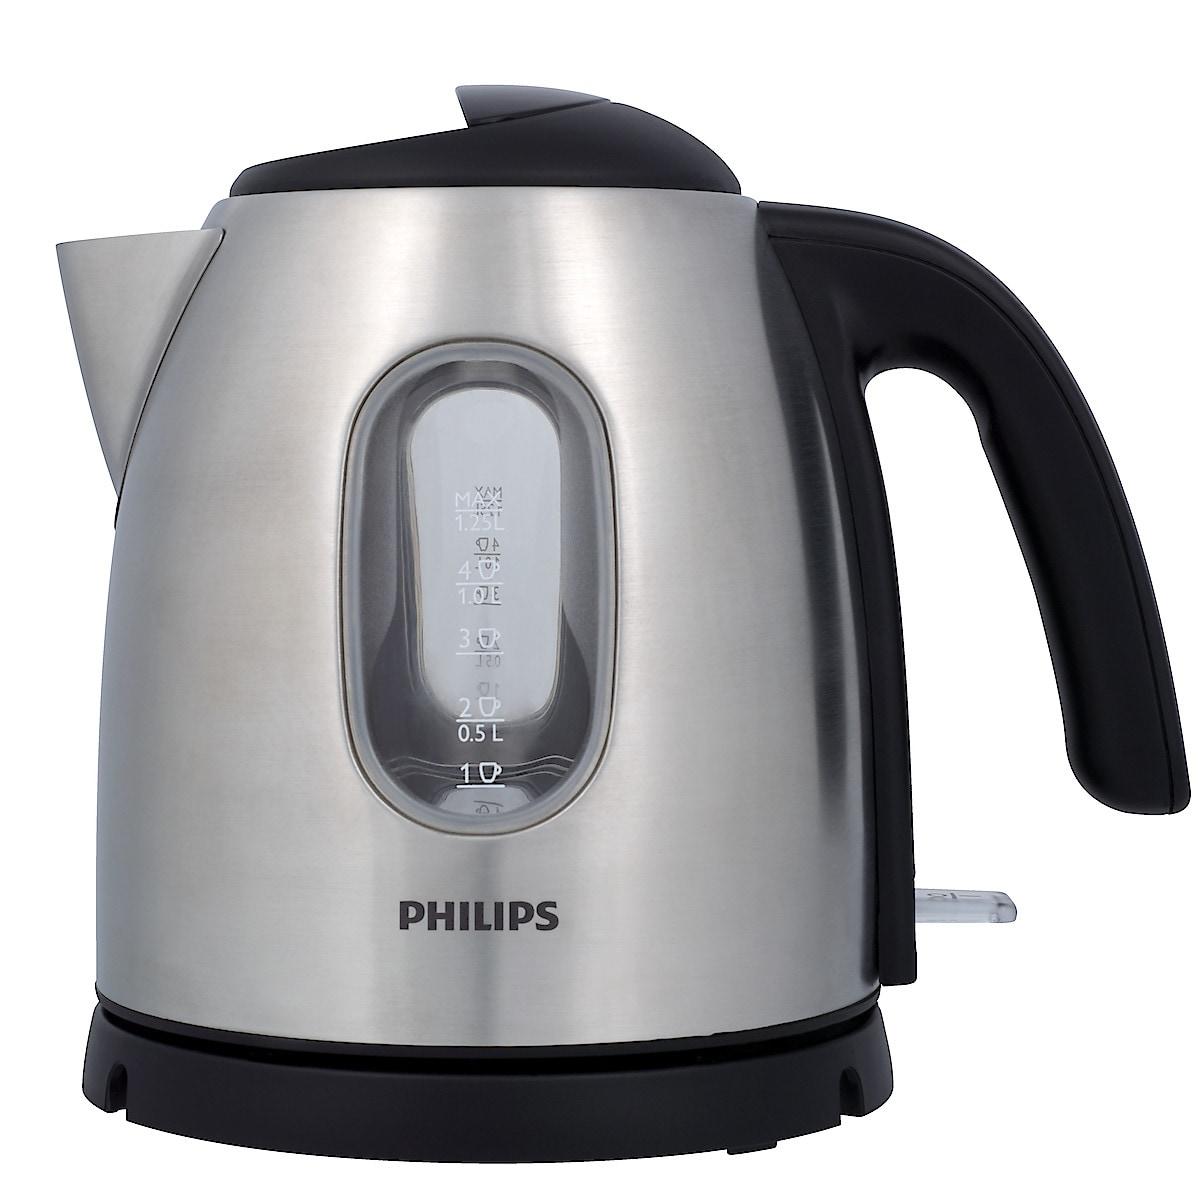 Philips HD4622 vannkoker